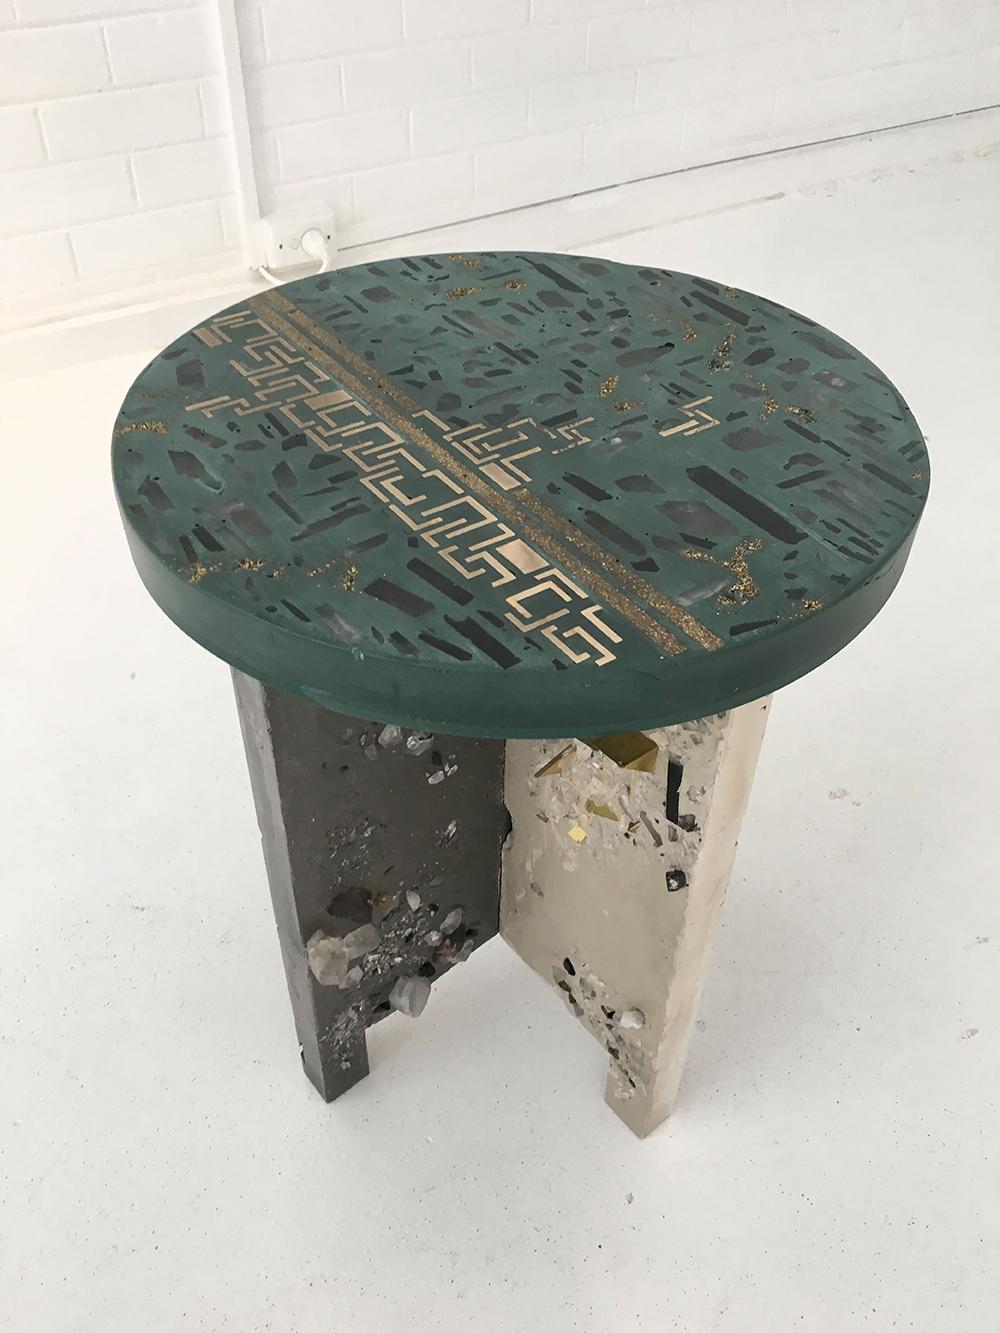 CBoots_Platto Table_Image 7